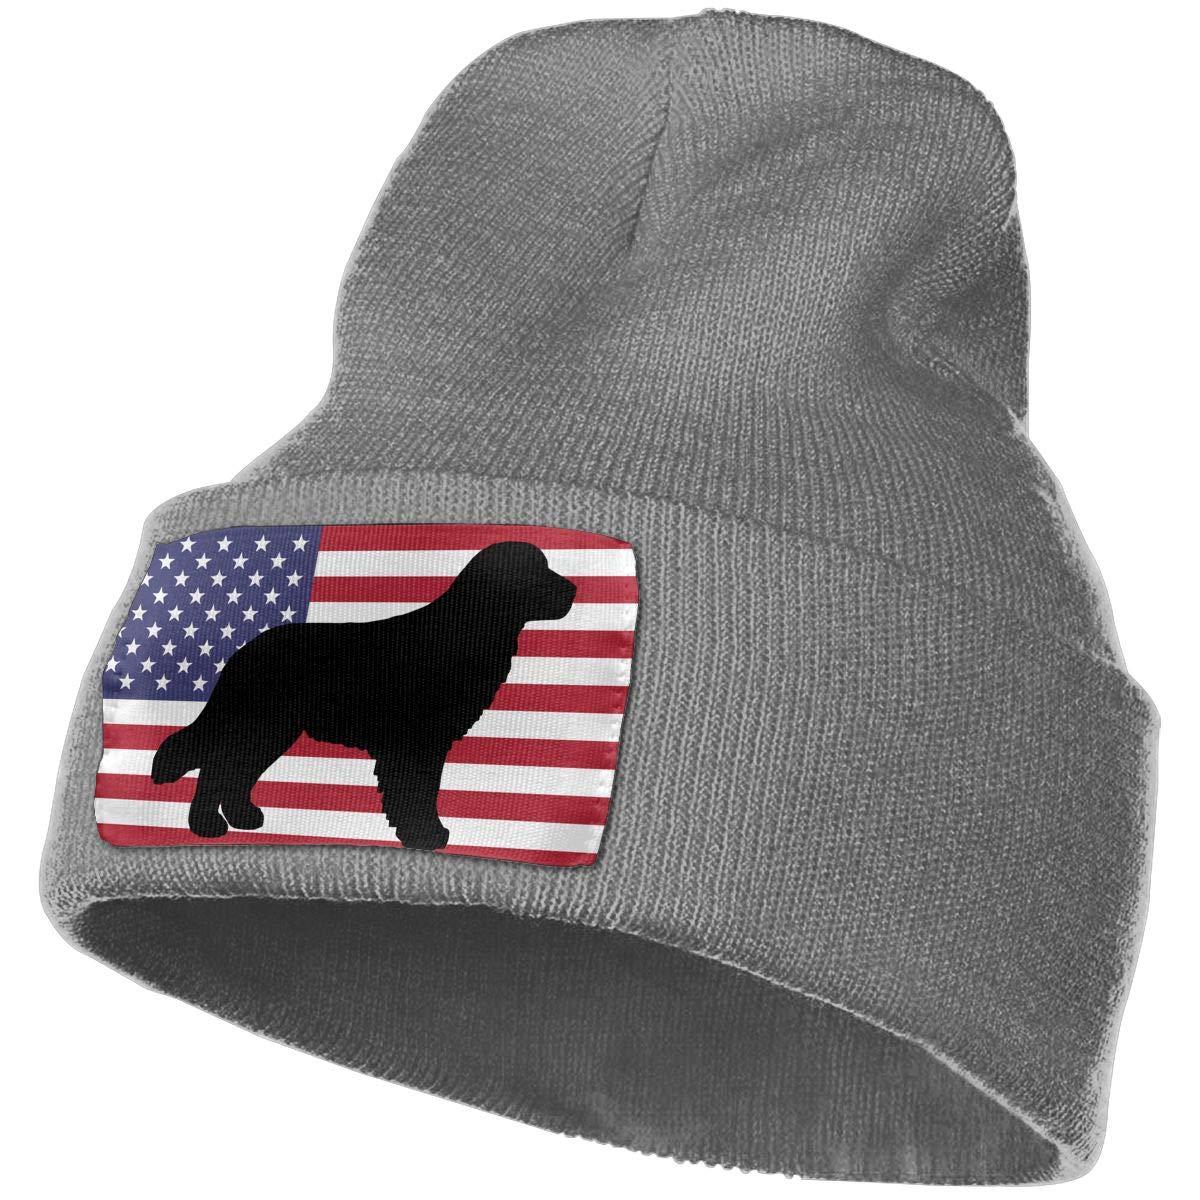 100/% Acrylic Beanie Hat Golden Retriever USA Flag Warm Knitting Hat Mens Womens